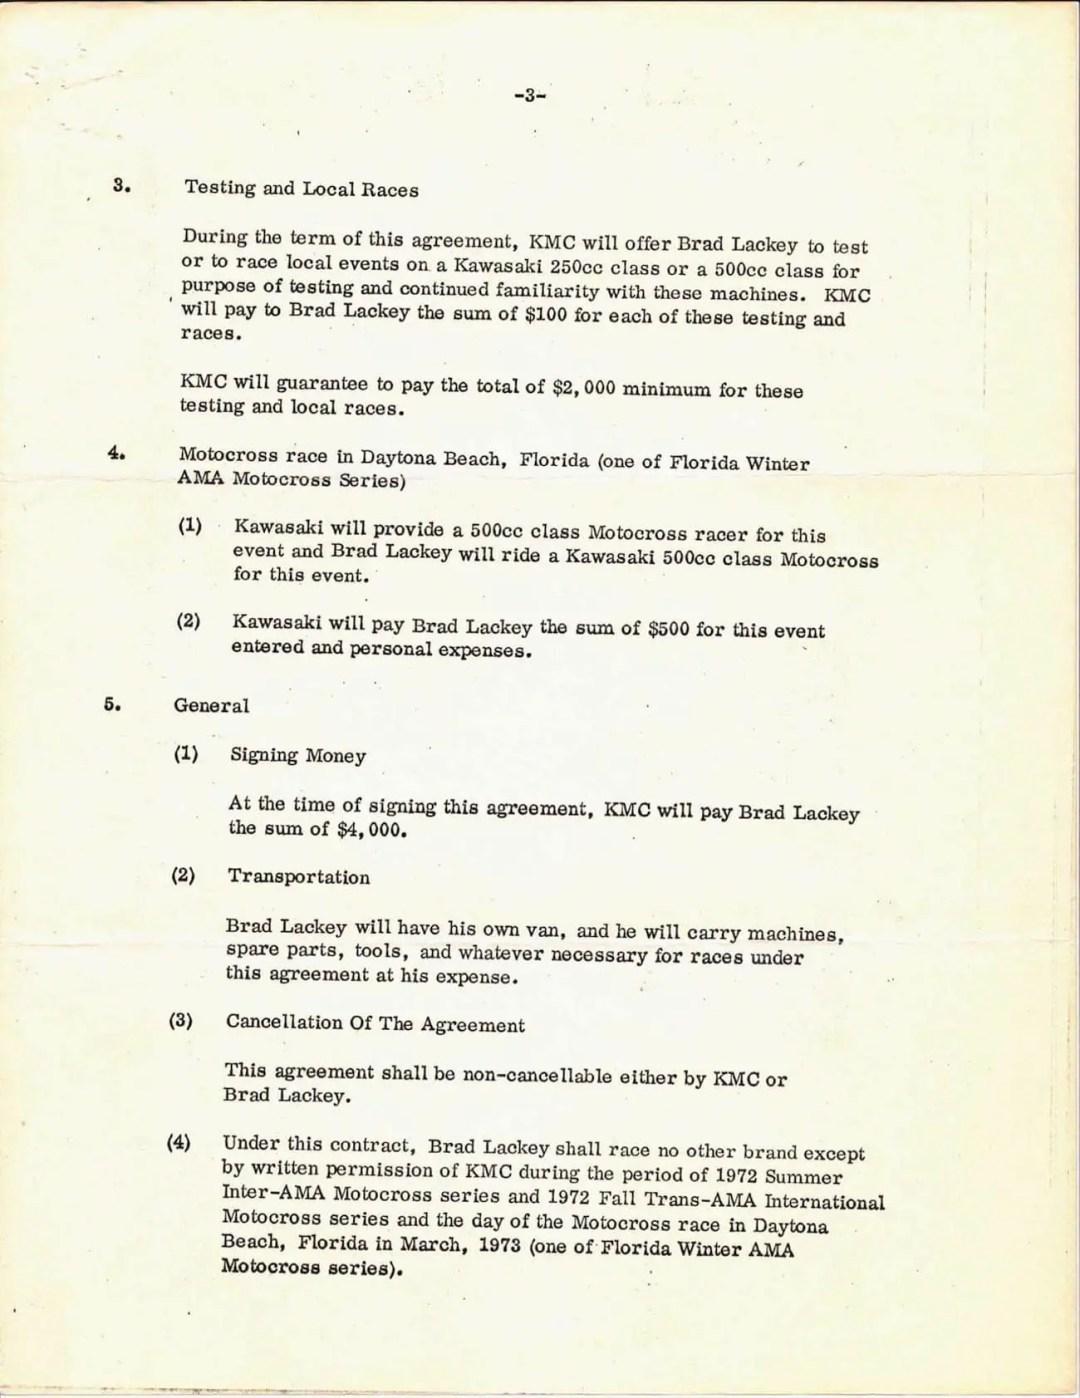 brad-lackey-contract-3